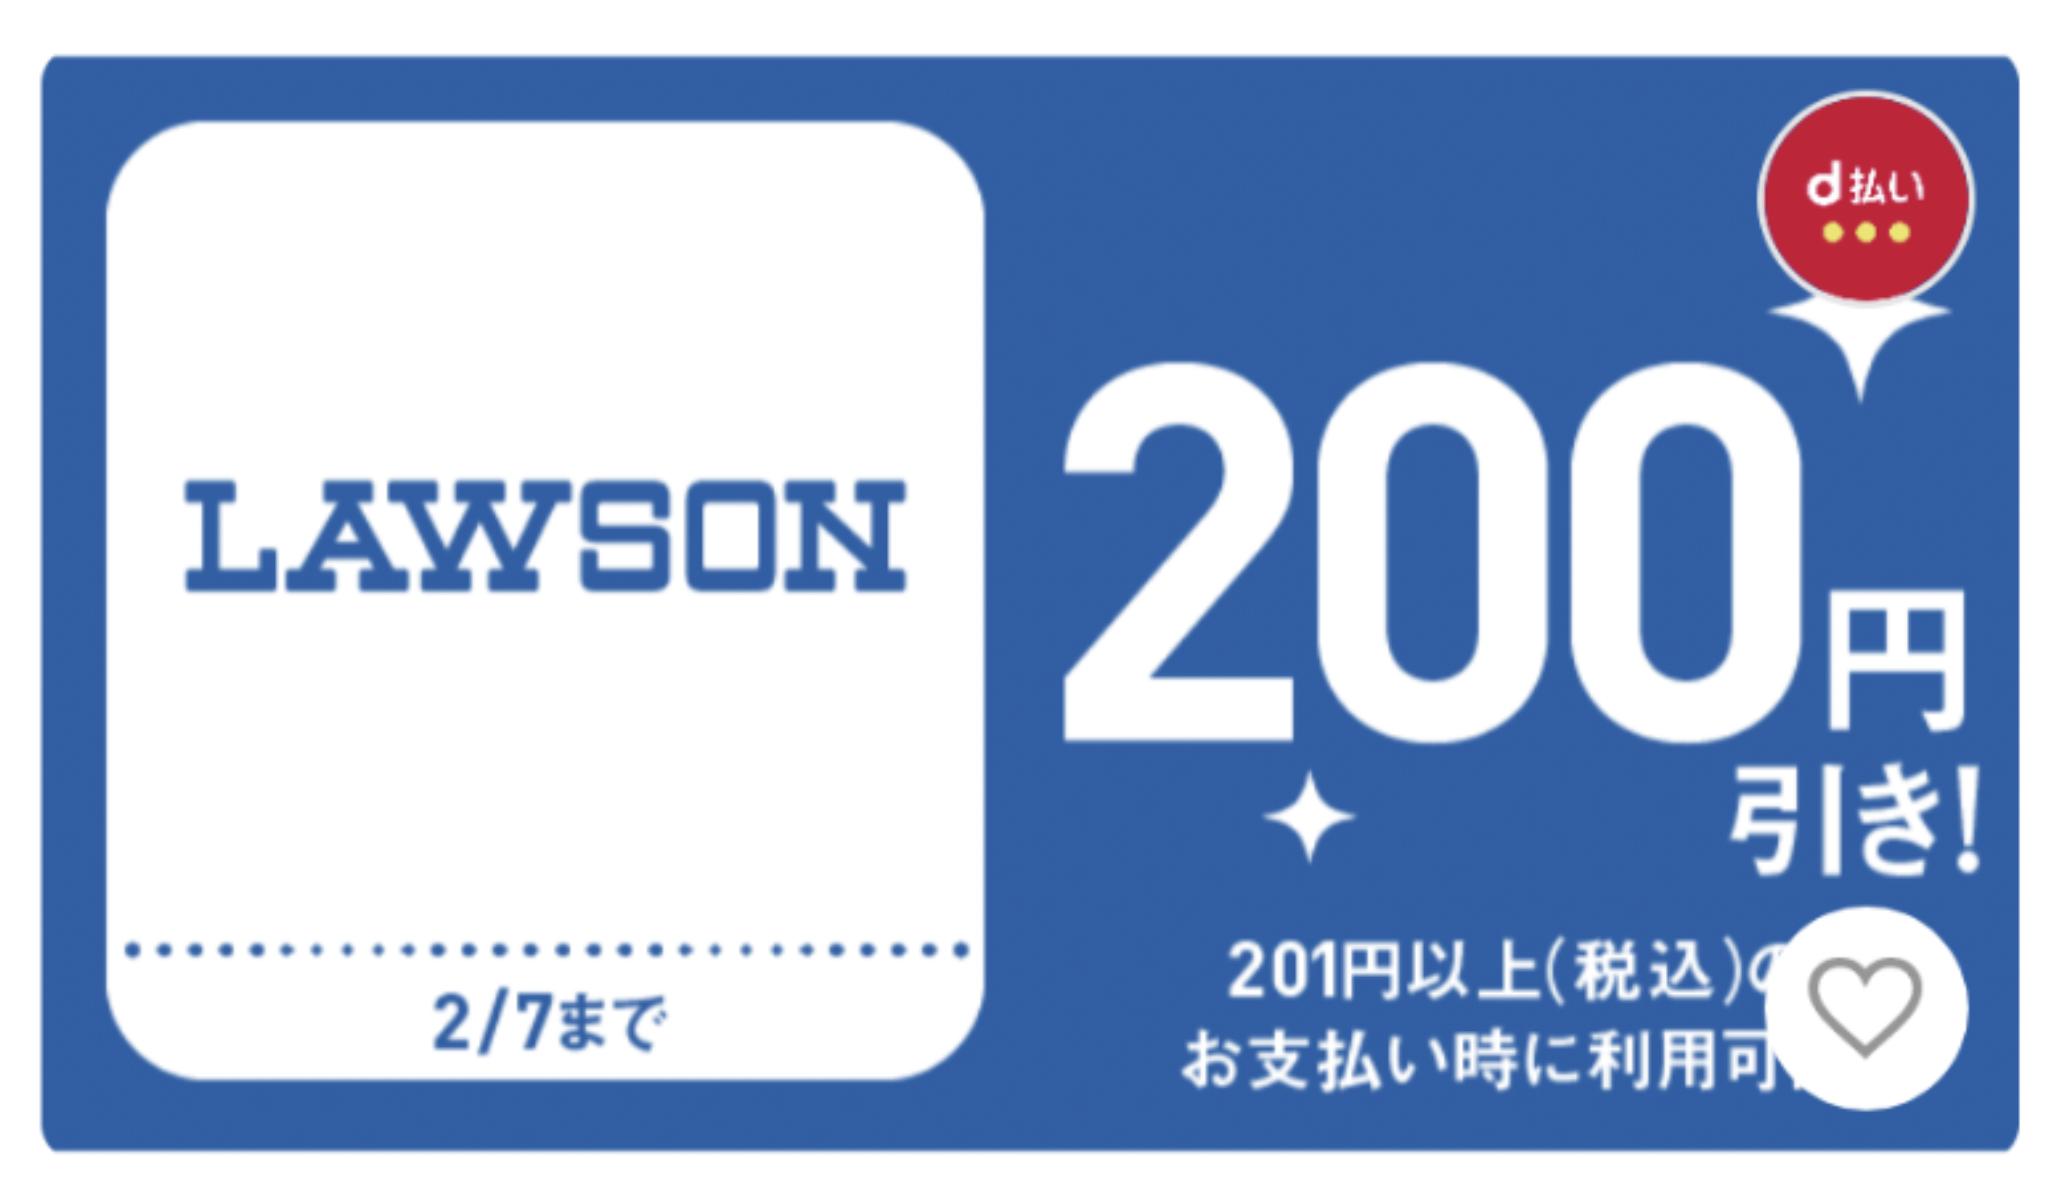 d払いでファミマート、ローソンで使える200円引クーポンを配信中。~2/7。